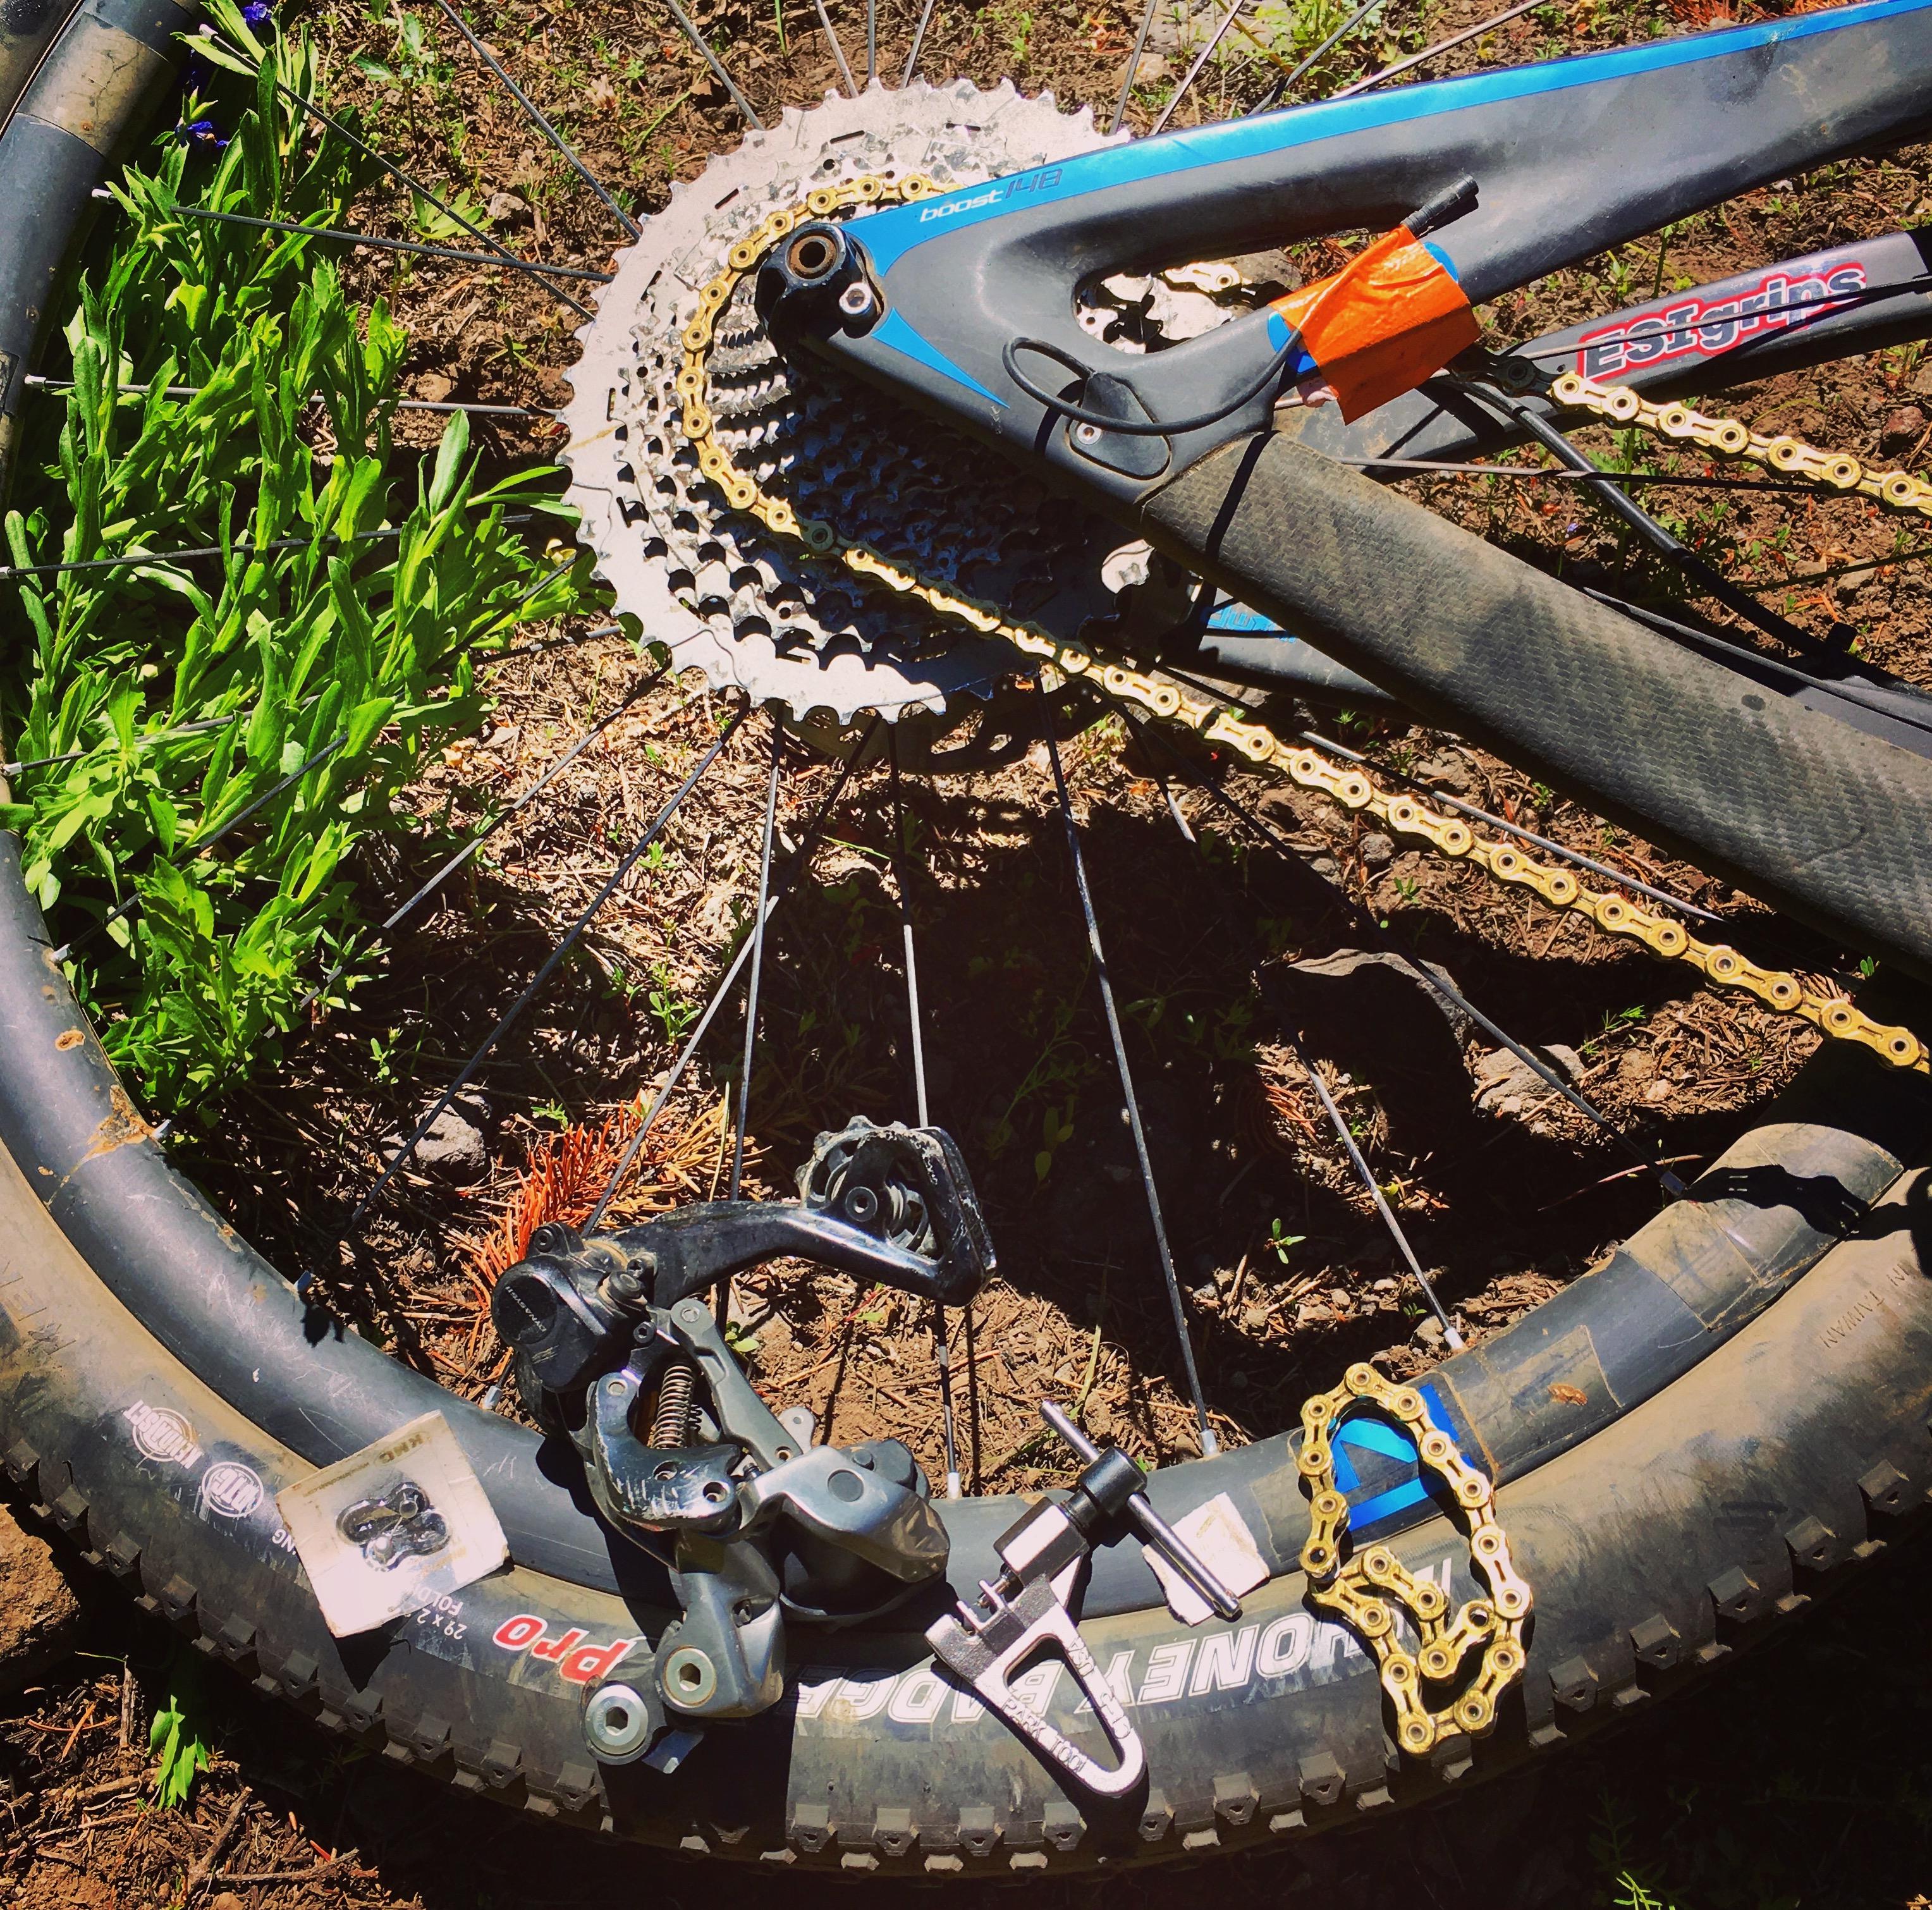 Trailside Repair